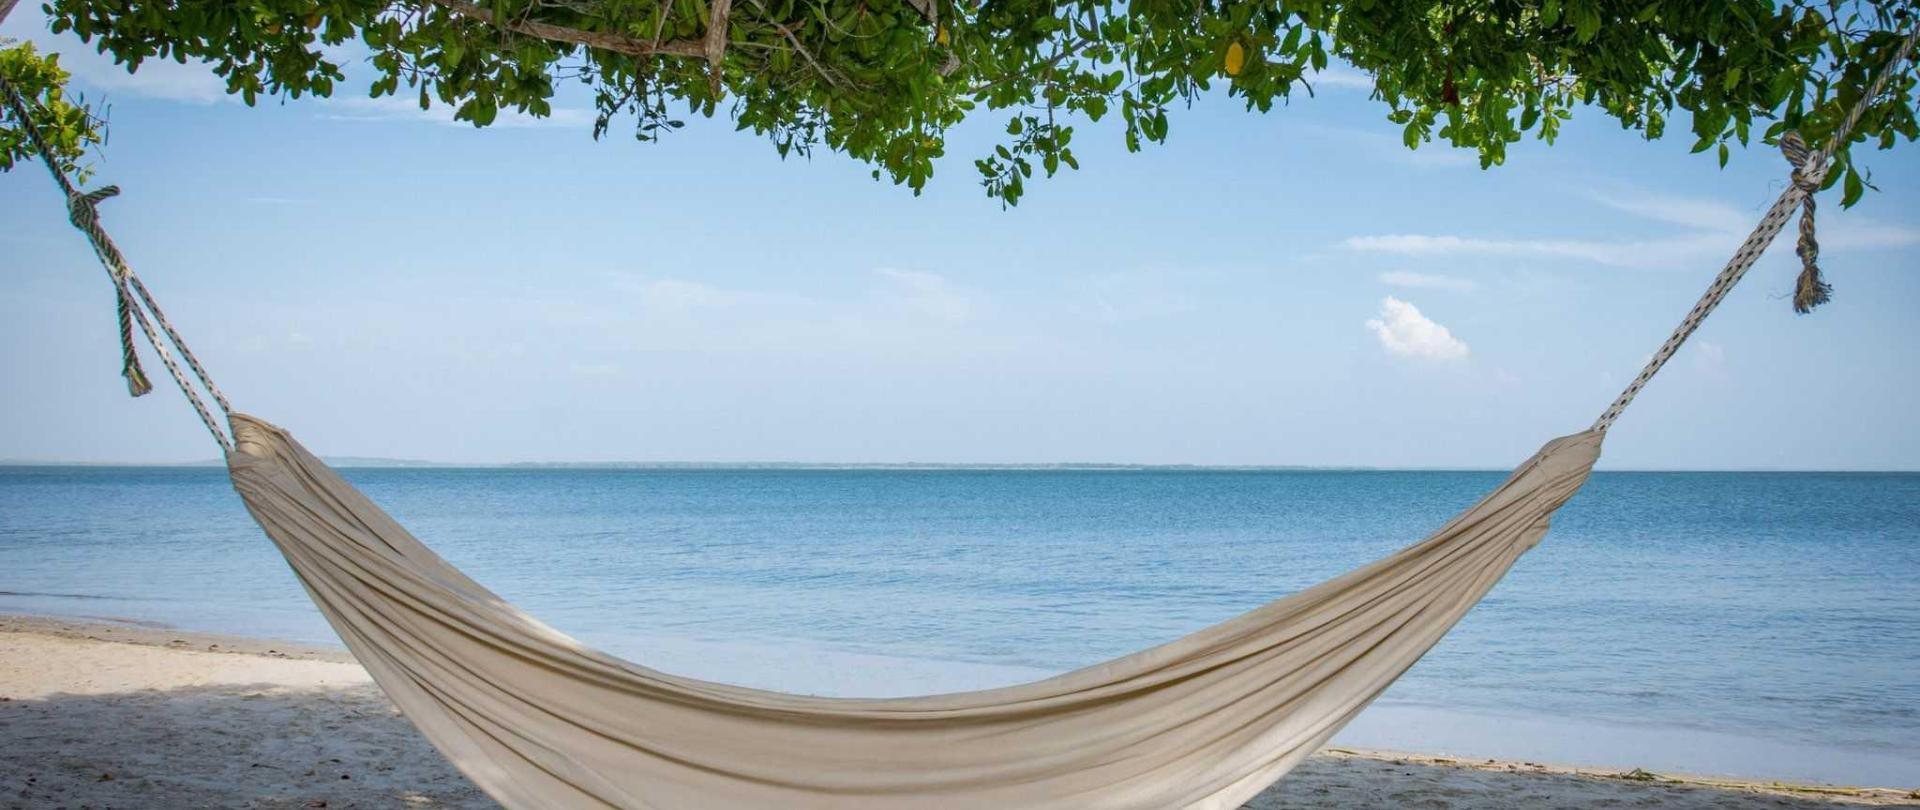 hotel-playa-manglares-7.jpg